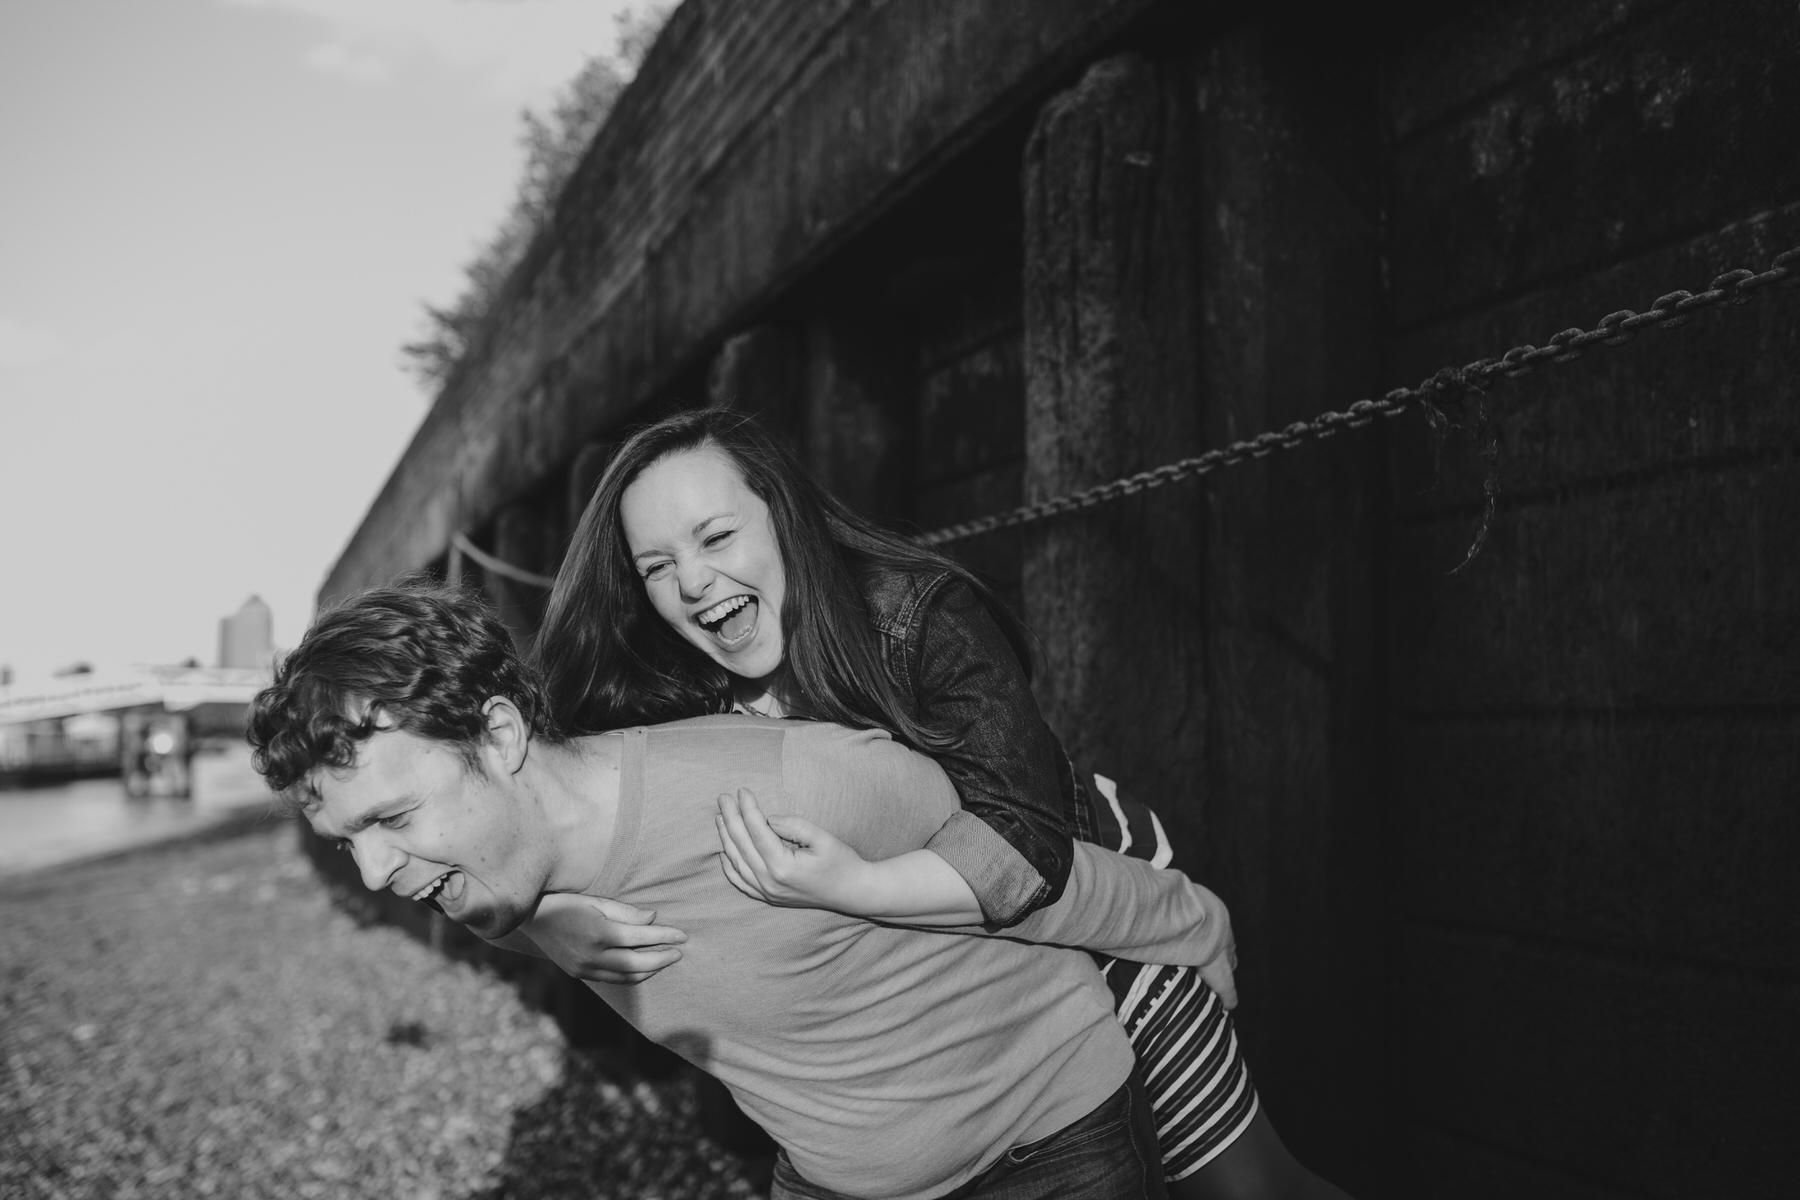 17-Quirky-engagement-London-couple-piggyback.jpg